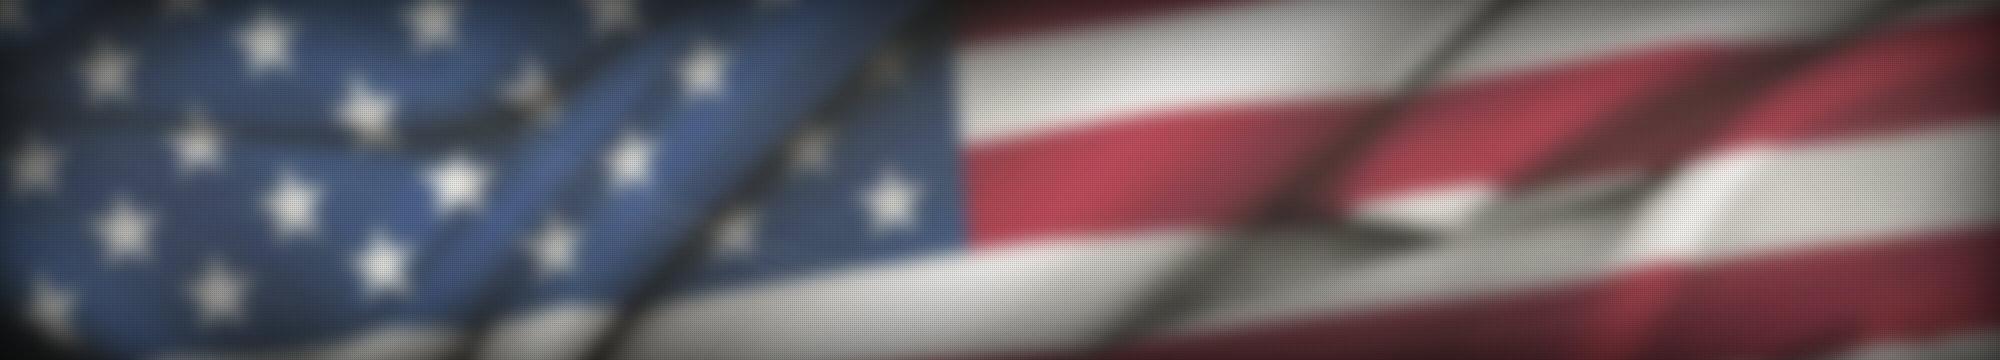 flag-background2